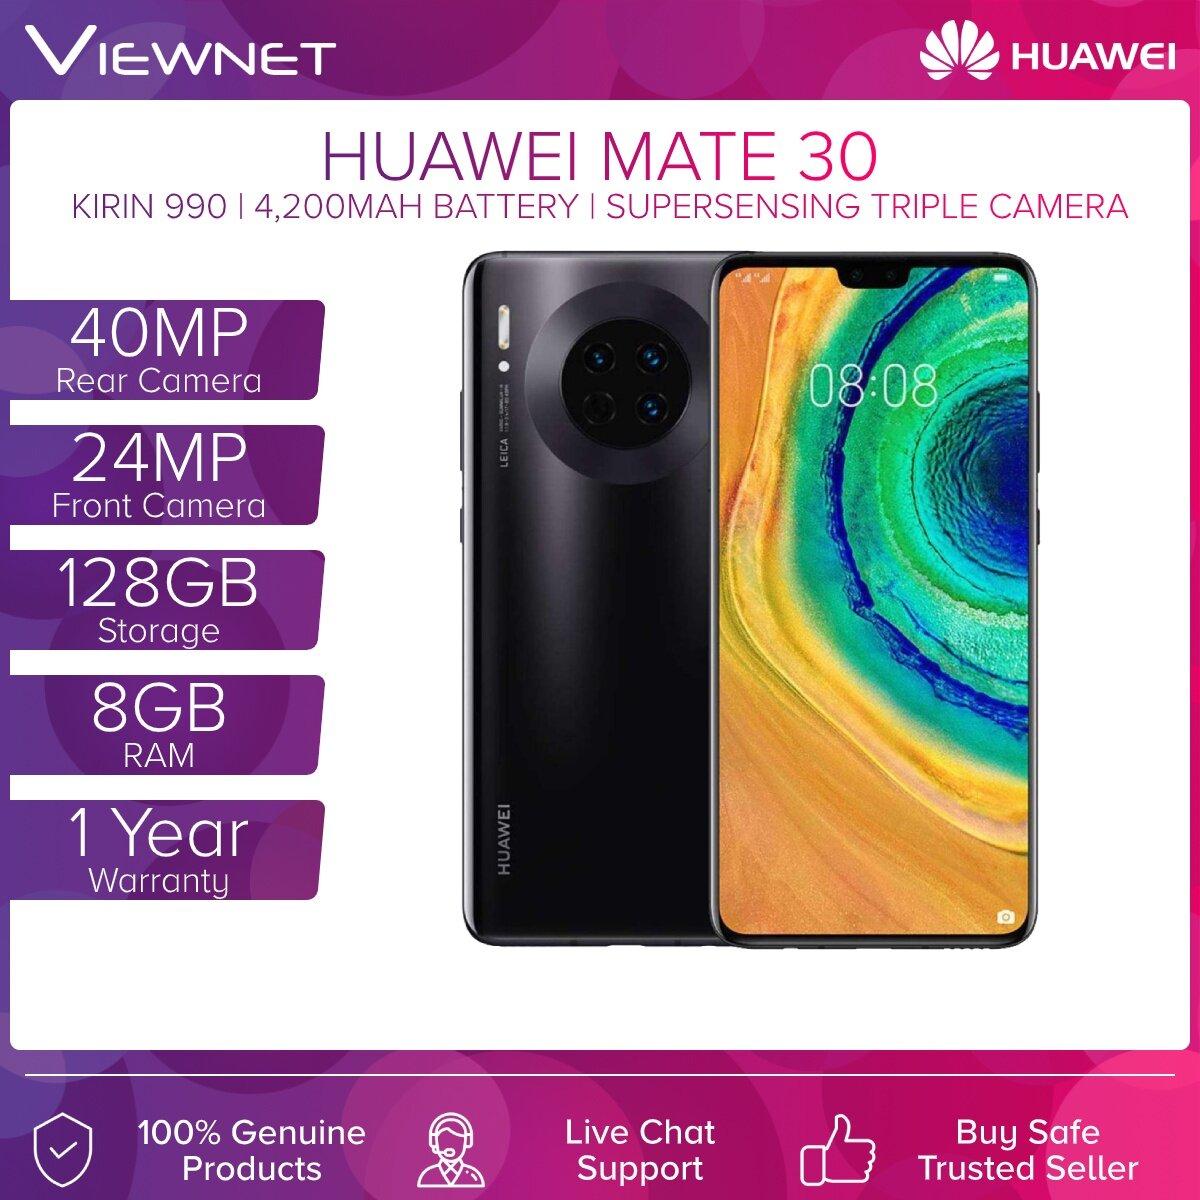 Huawei Mate 30 (8GB RAM + 128GB ROM) Black/Silver